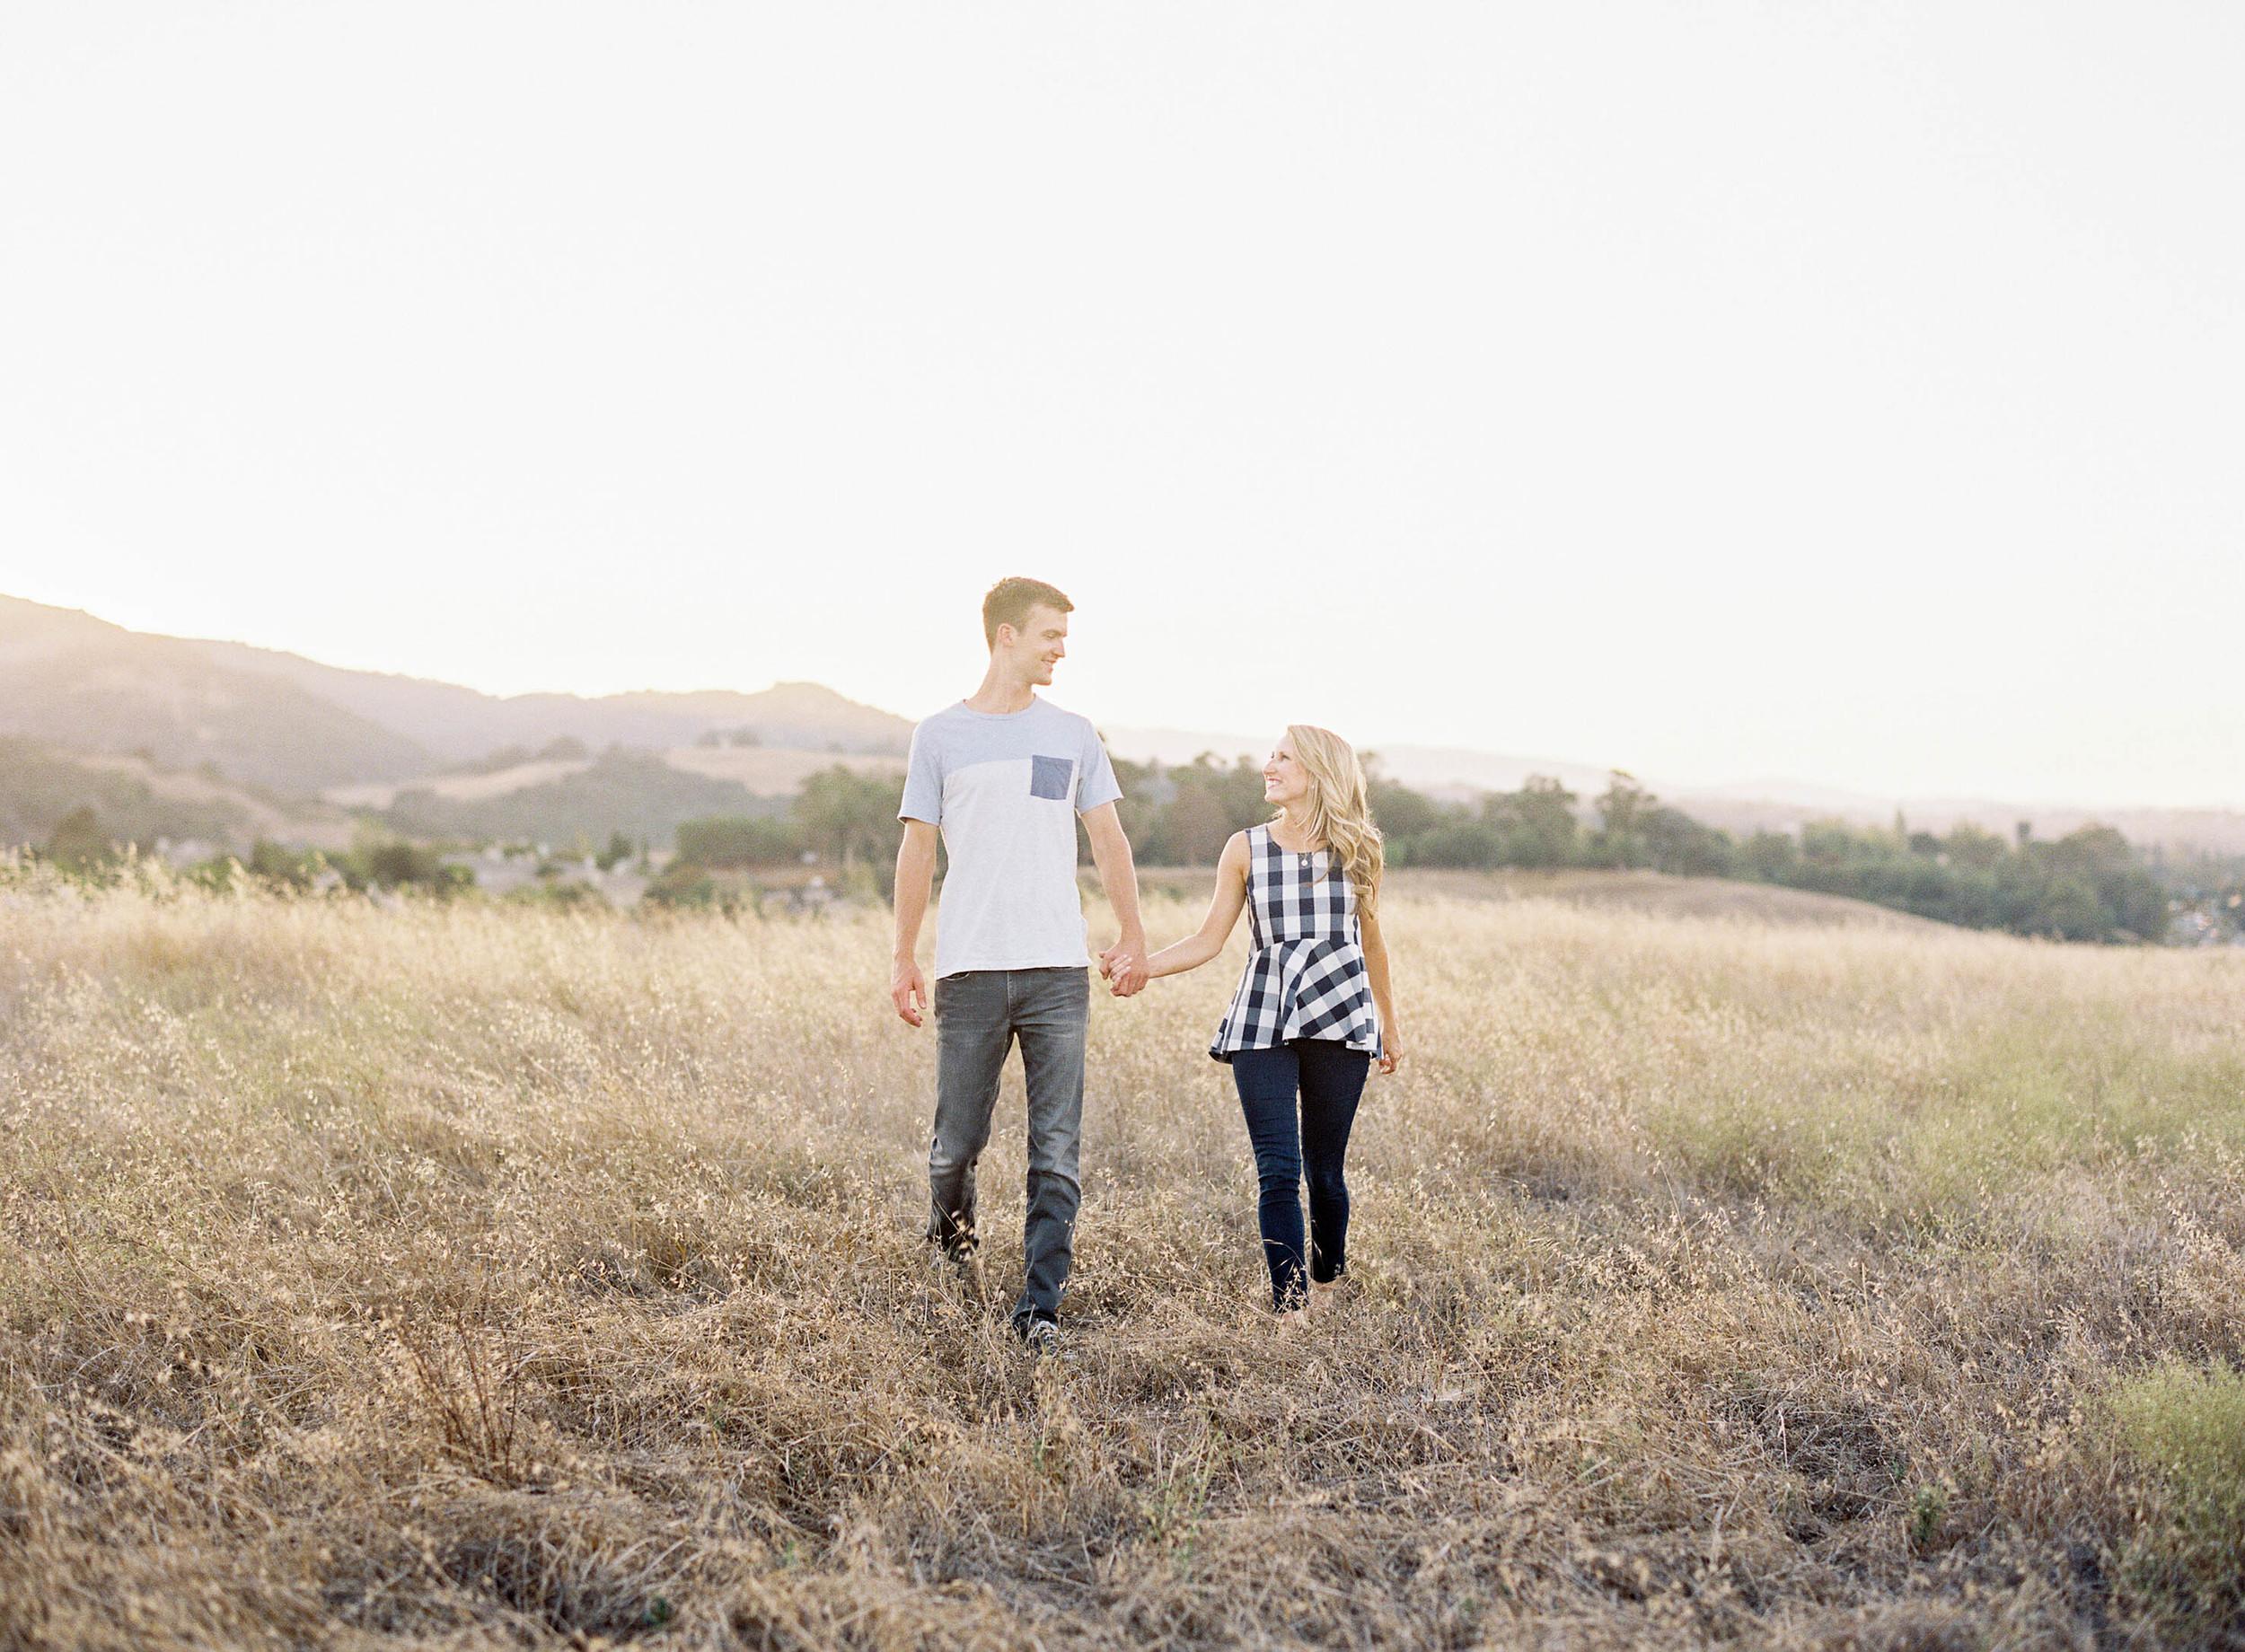 Meghan Mehan Photography - Fine Art Film Wedding Photography - San Francisco   Napa   Sonoma   Big Sur   Chicago   Minneapolis   Milwaukee   Lake Geneva   Door County   Wisconsin 013.jpg